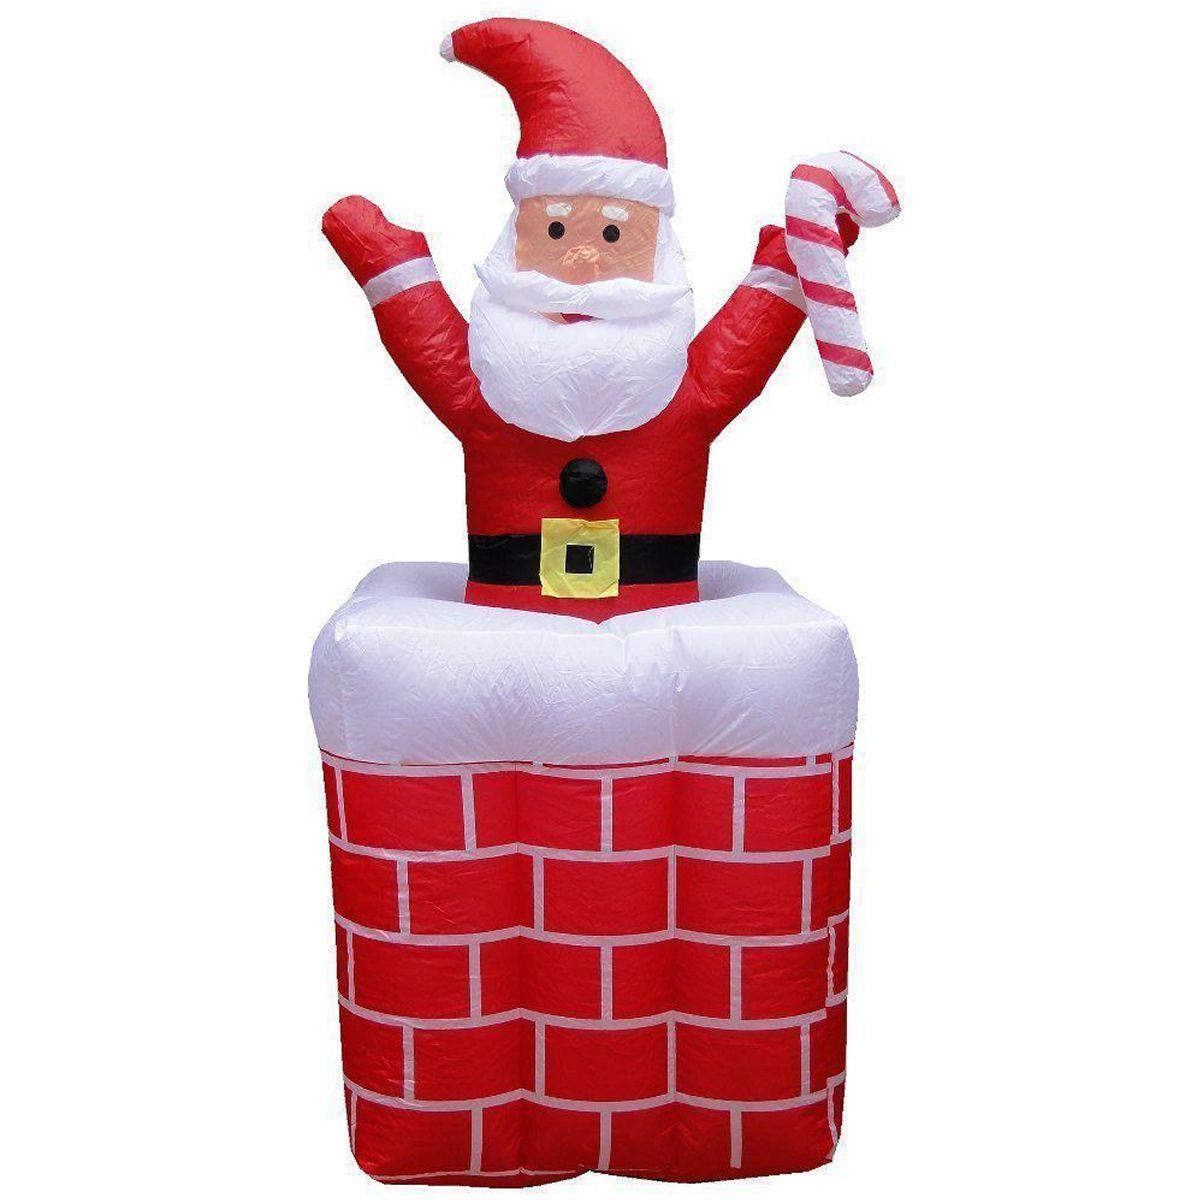 Papai Noel na Chaminé Inflável Sobe Desce 1,80m - 1584